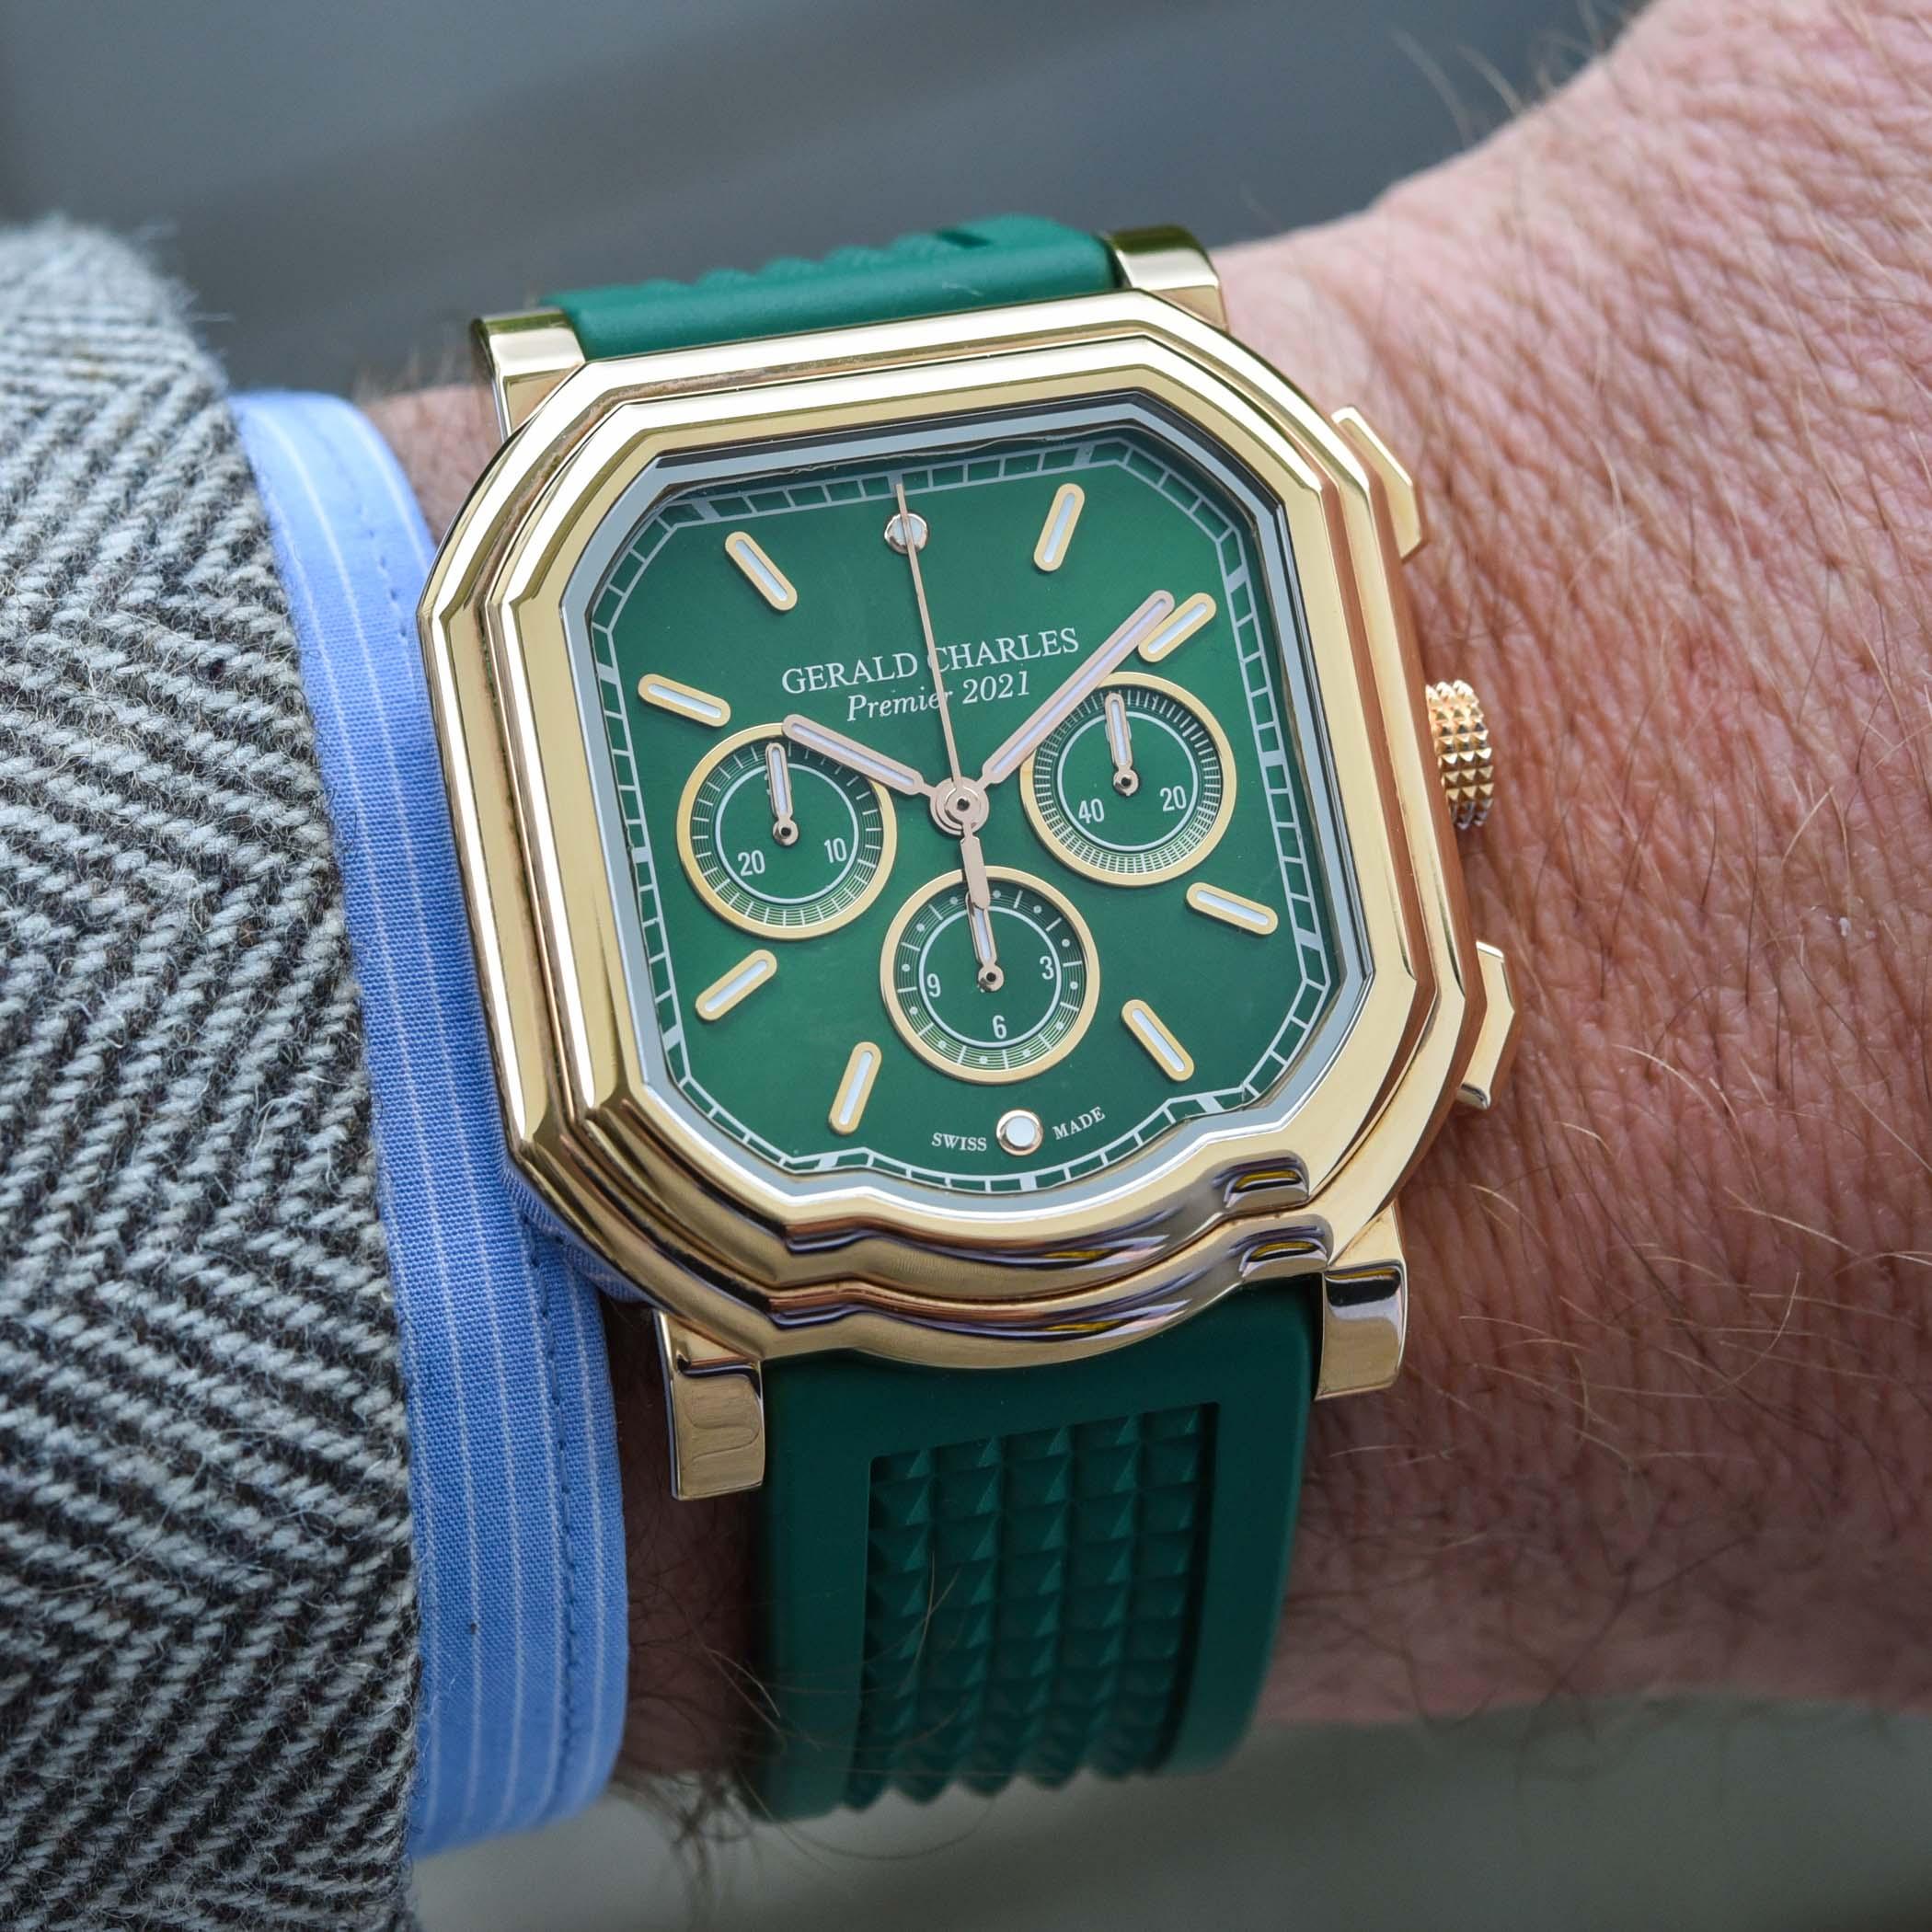 Gerald Charles Maestro 3.0 Premier 2021 Chronograph Green Dial